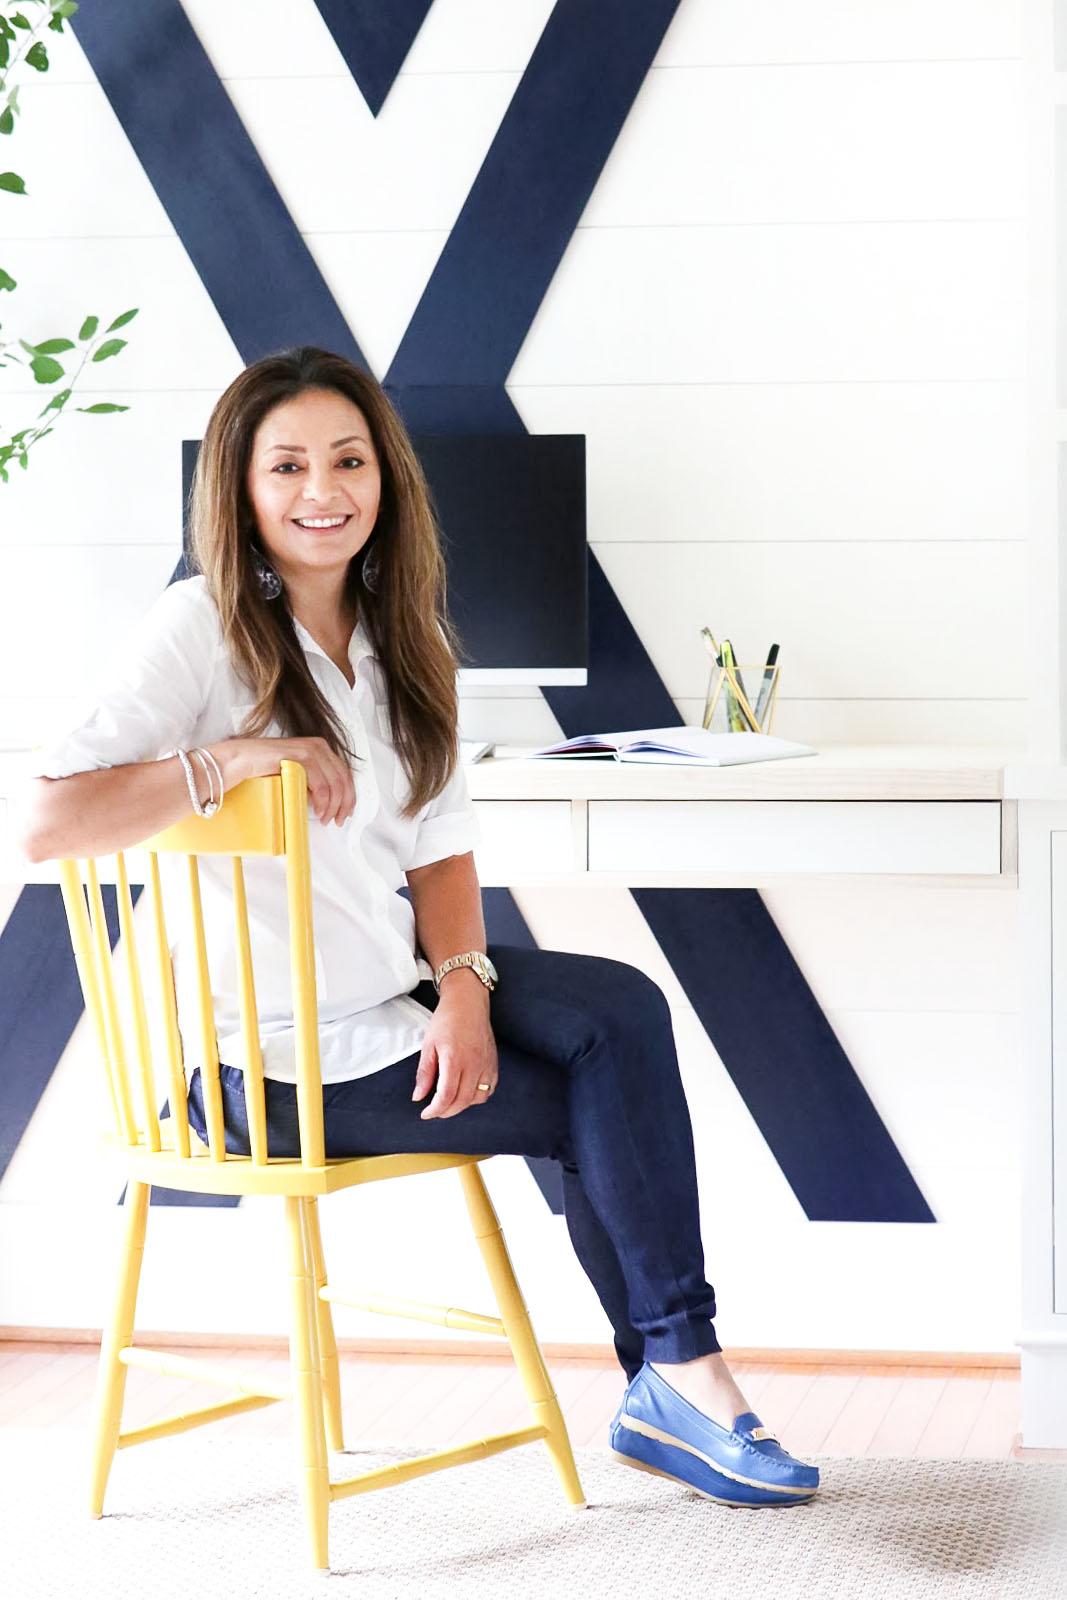 Cristina Garay - Built-in desk